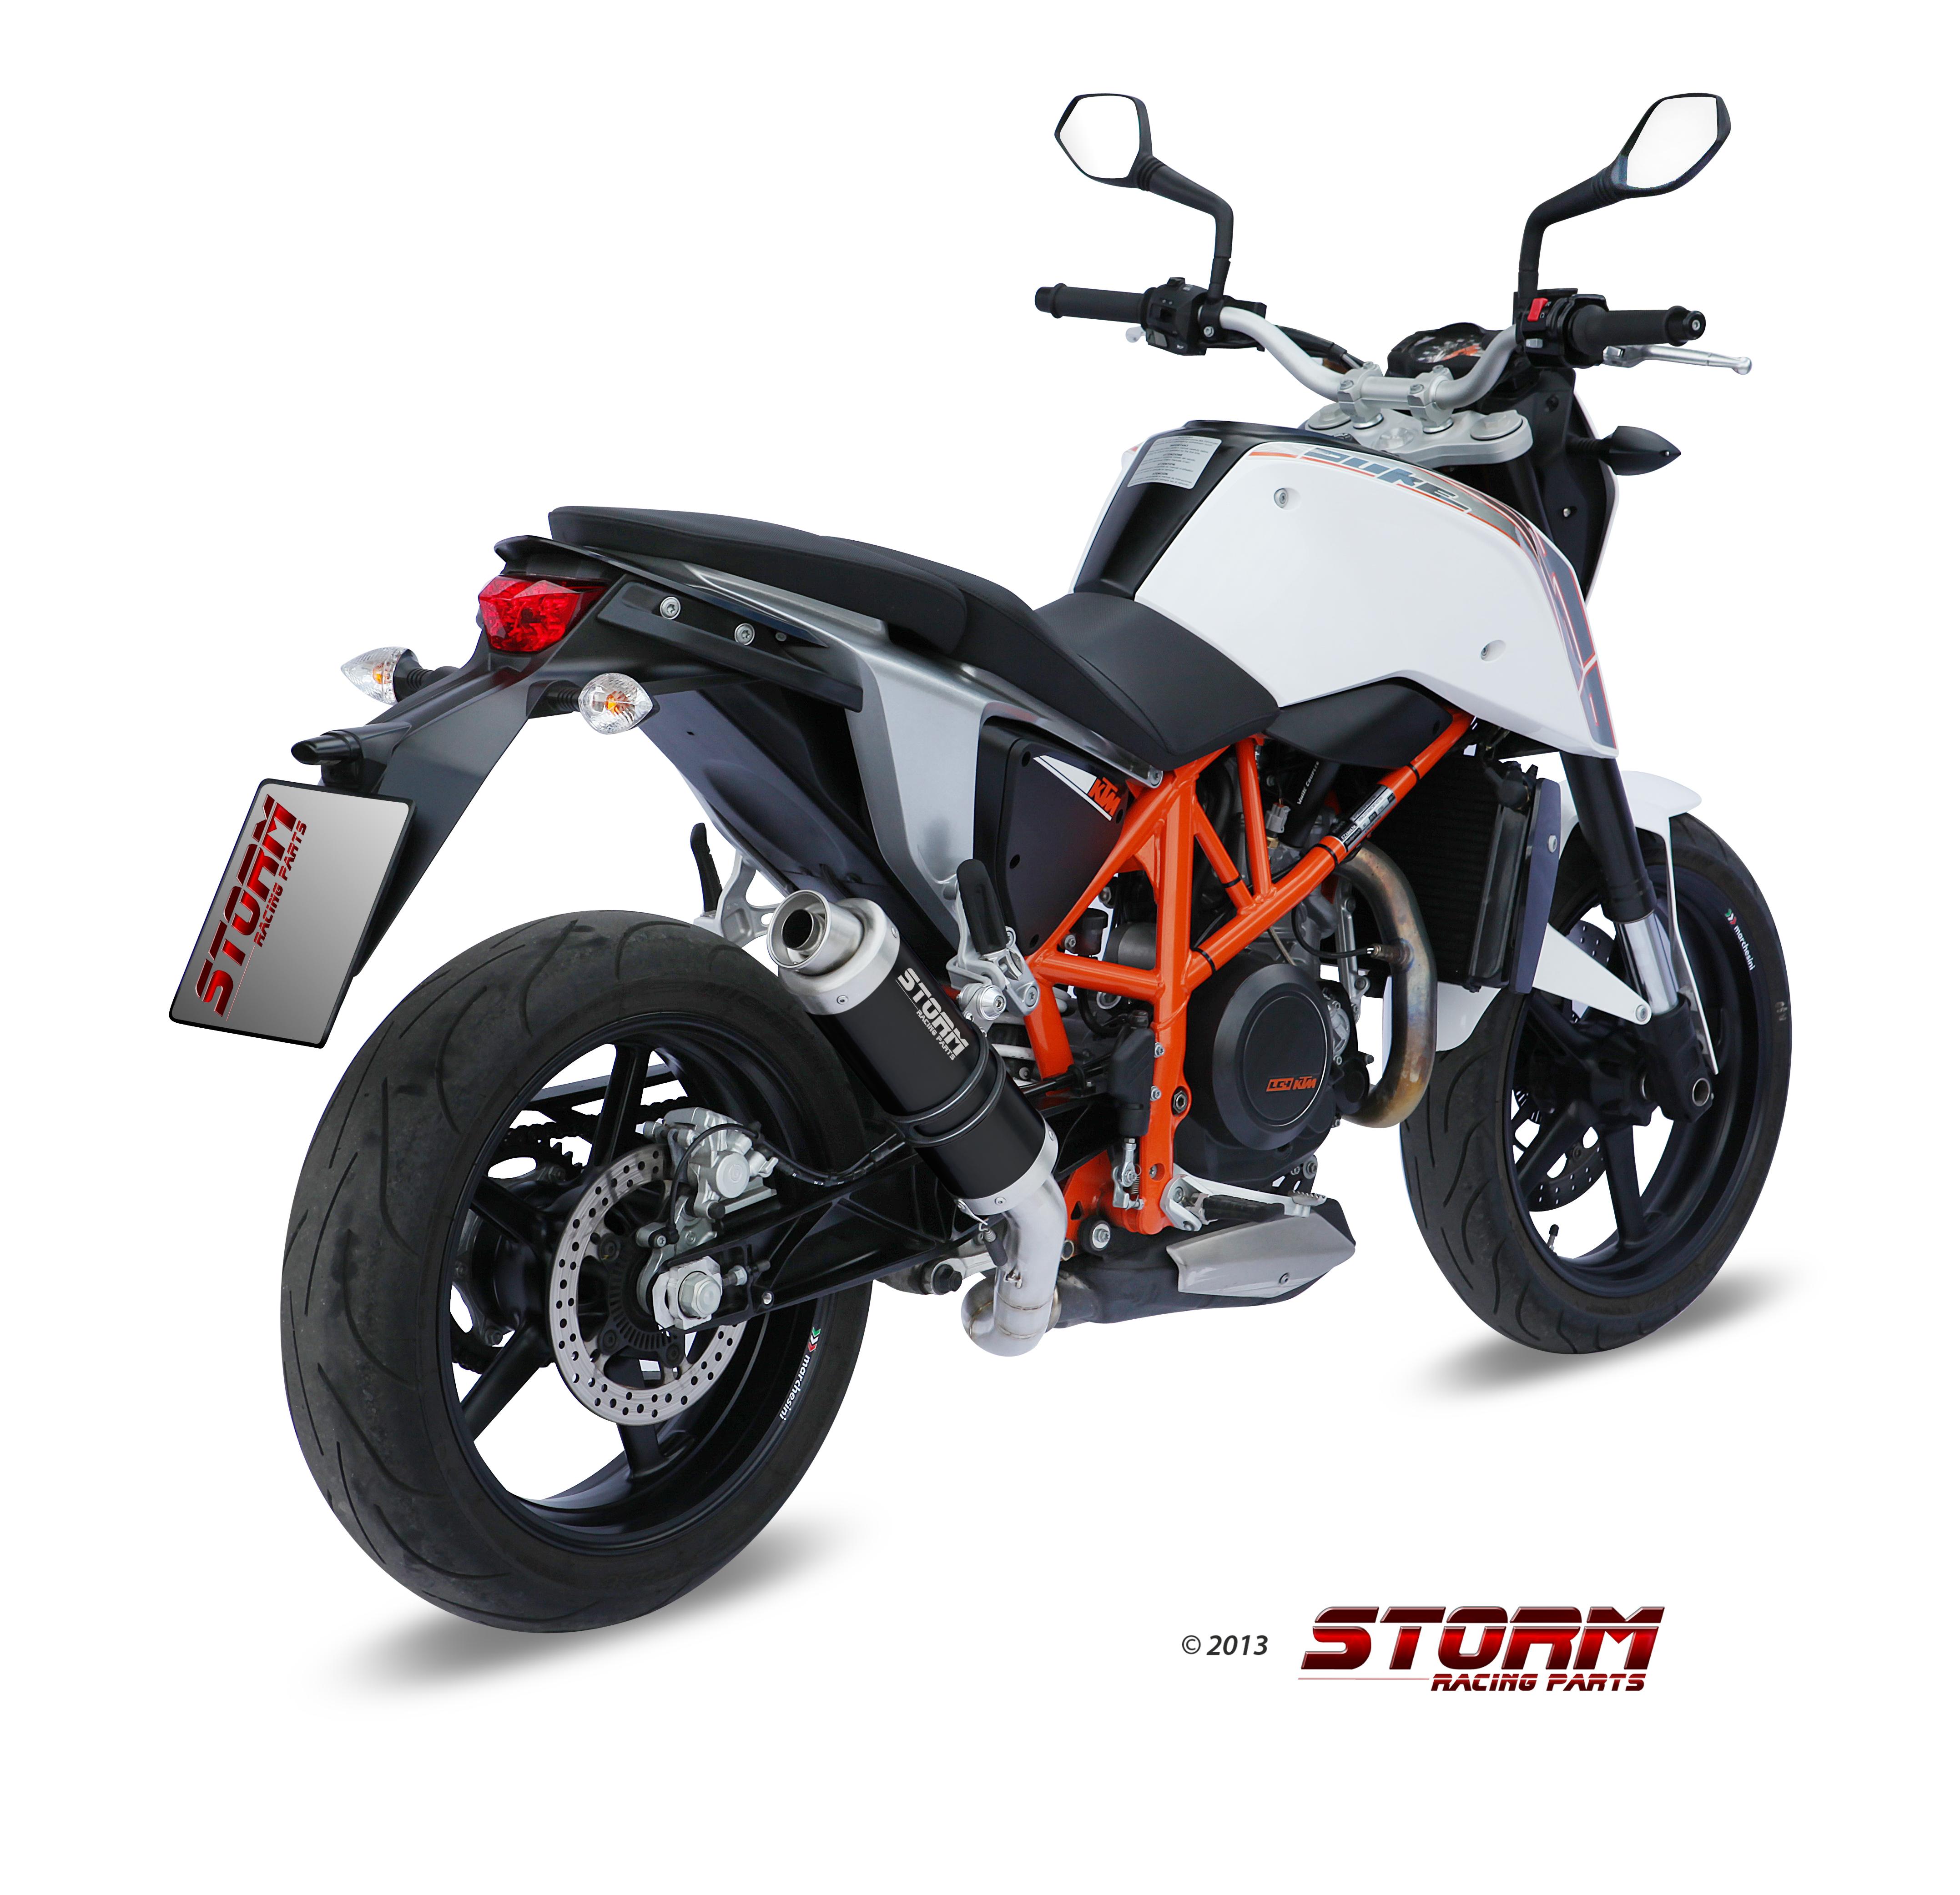 Scarico KTM 690 DUKE Storm Gp Inox Nero KT.010.LXSB